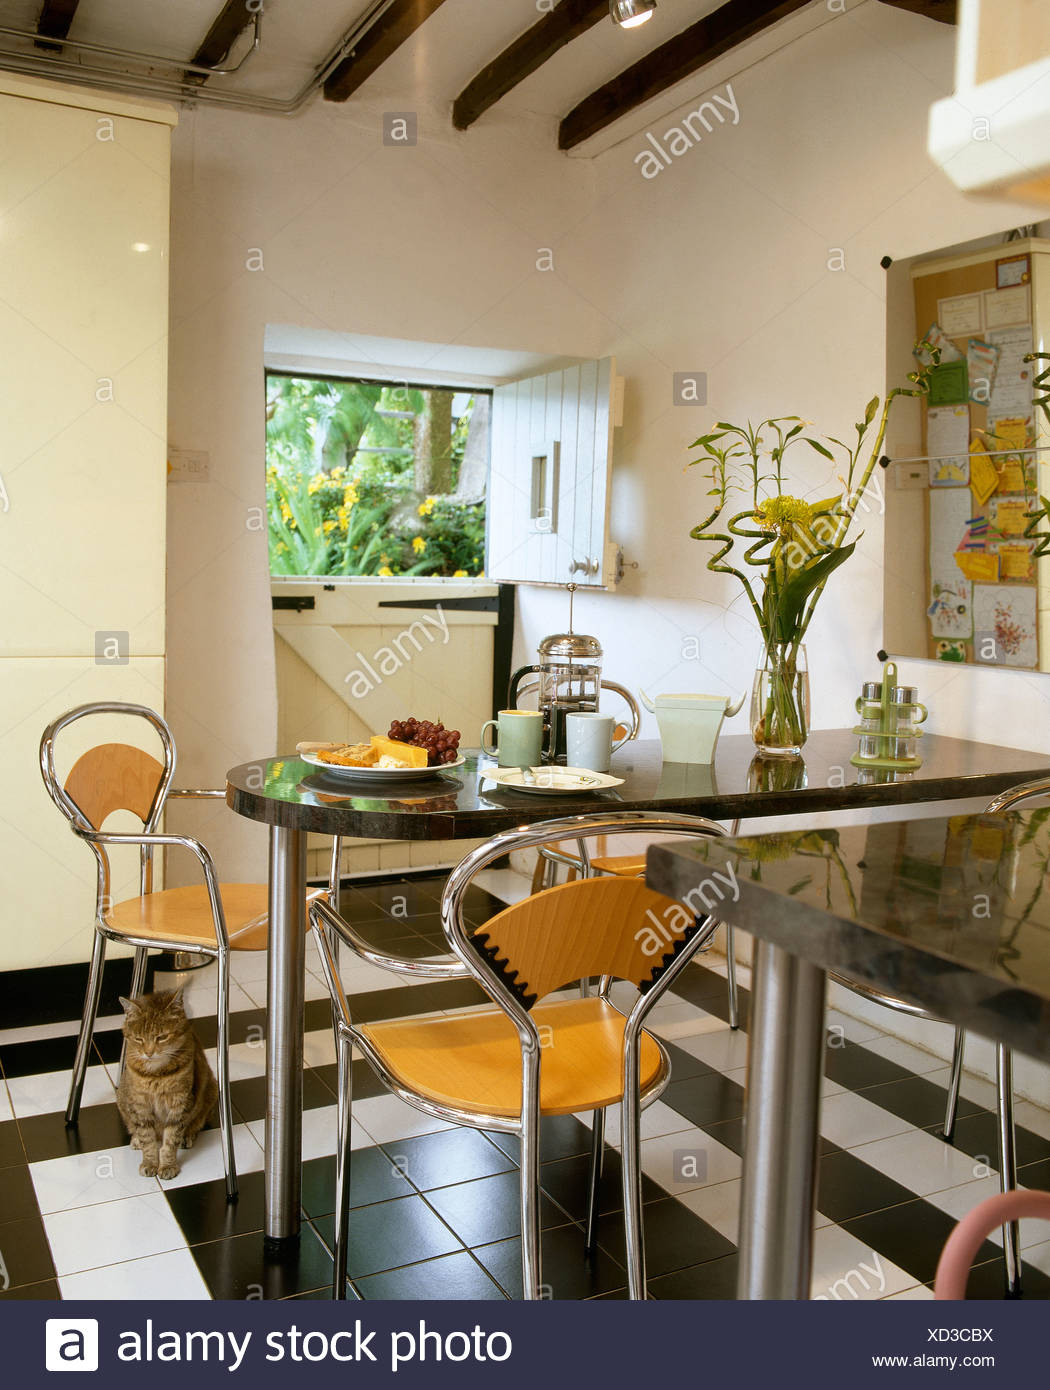 Chrome Wood Stools At Granite Steel Breakfast Bar Table In Modern